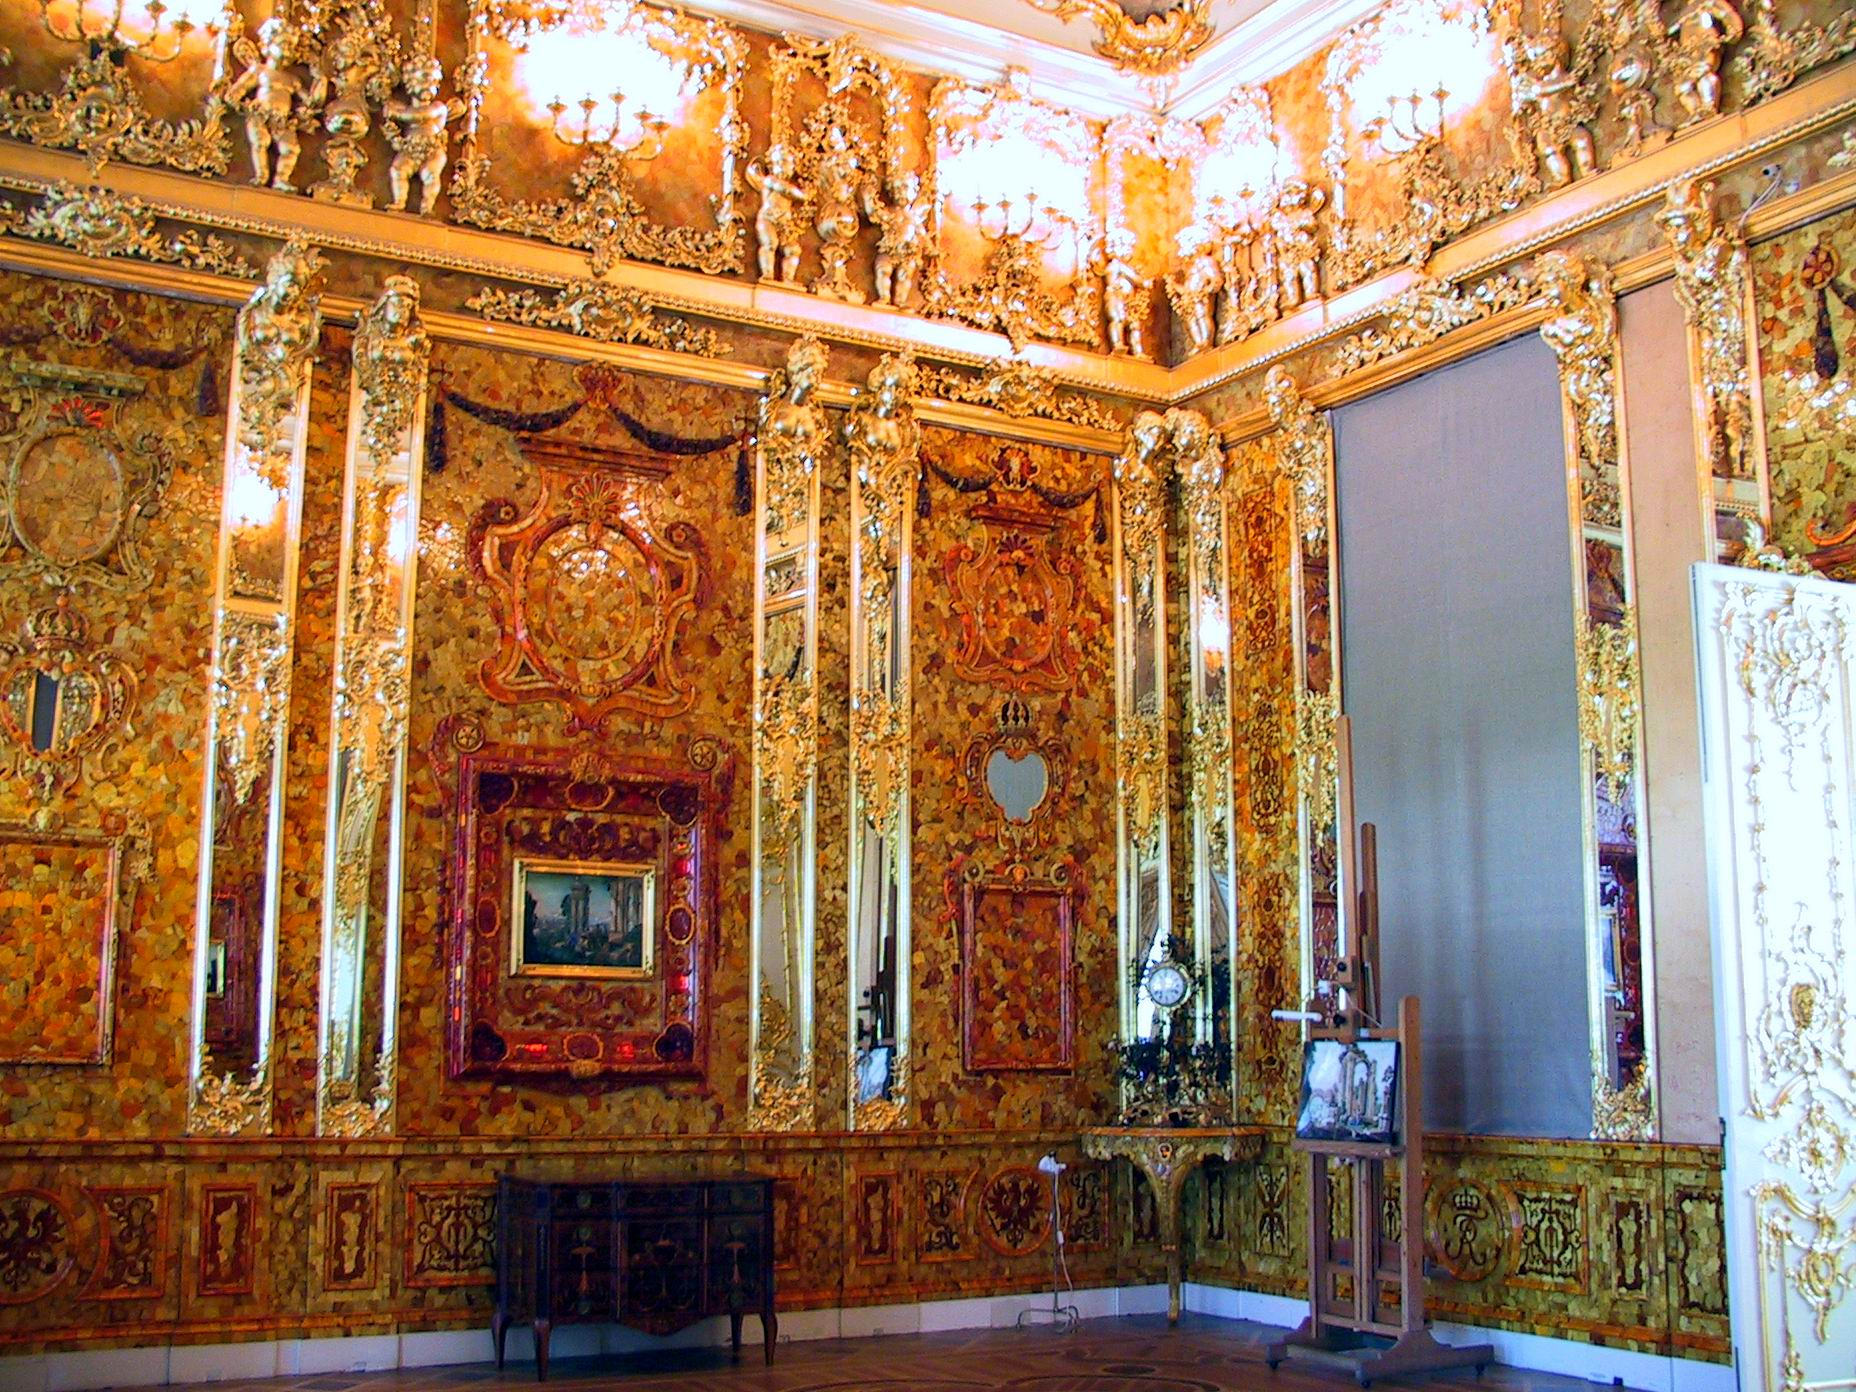 B5-05-Amber-Roomof-Catherine-Palace-St.-Petersburg-Russia.jpg